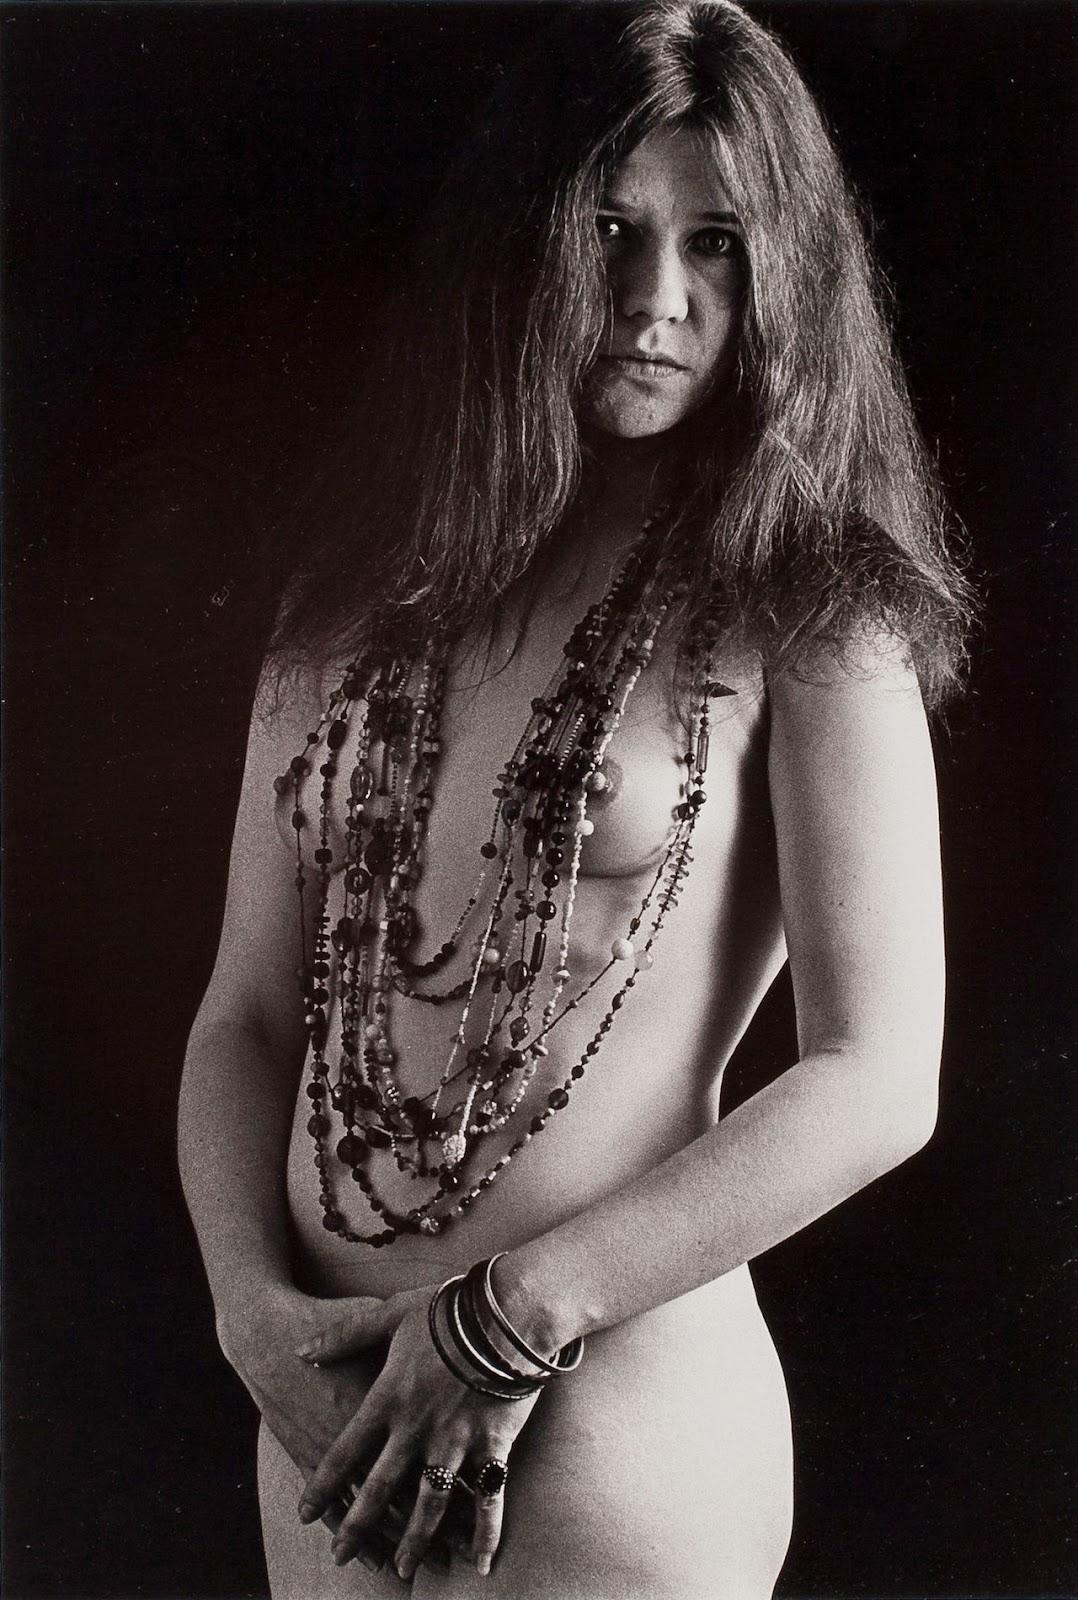 Janis joplin nude pictures very